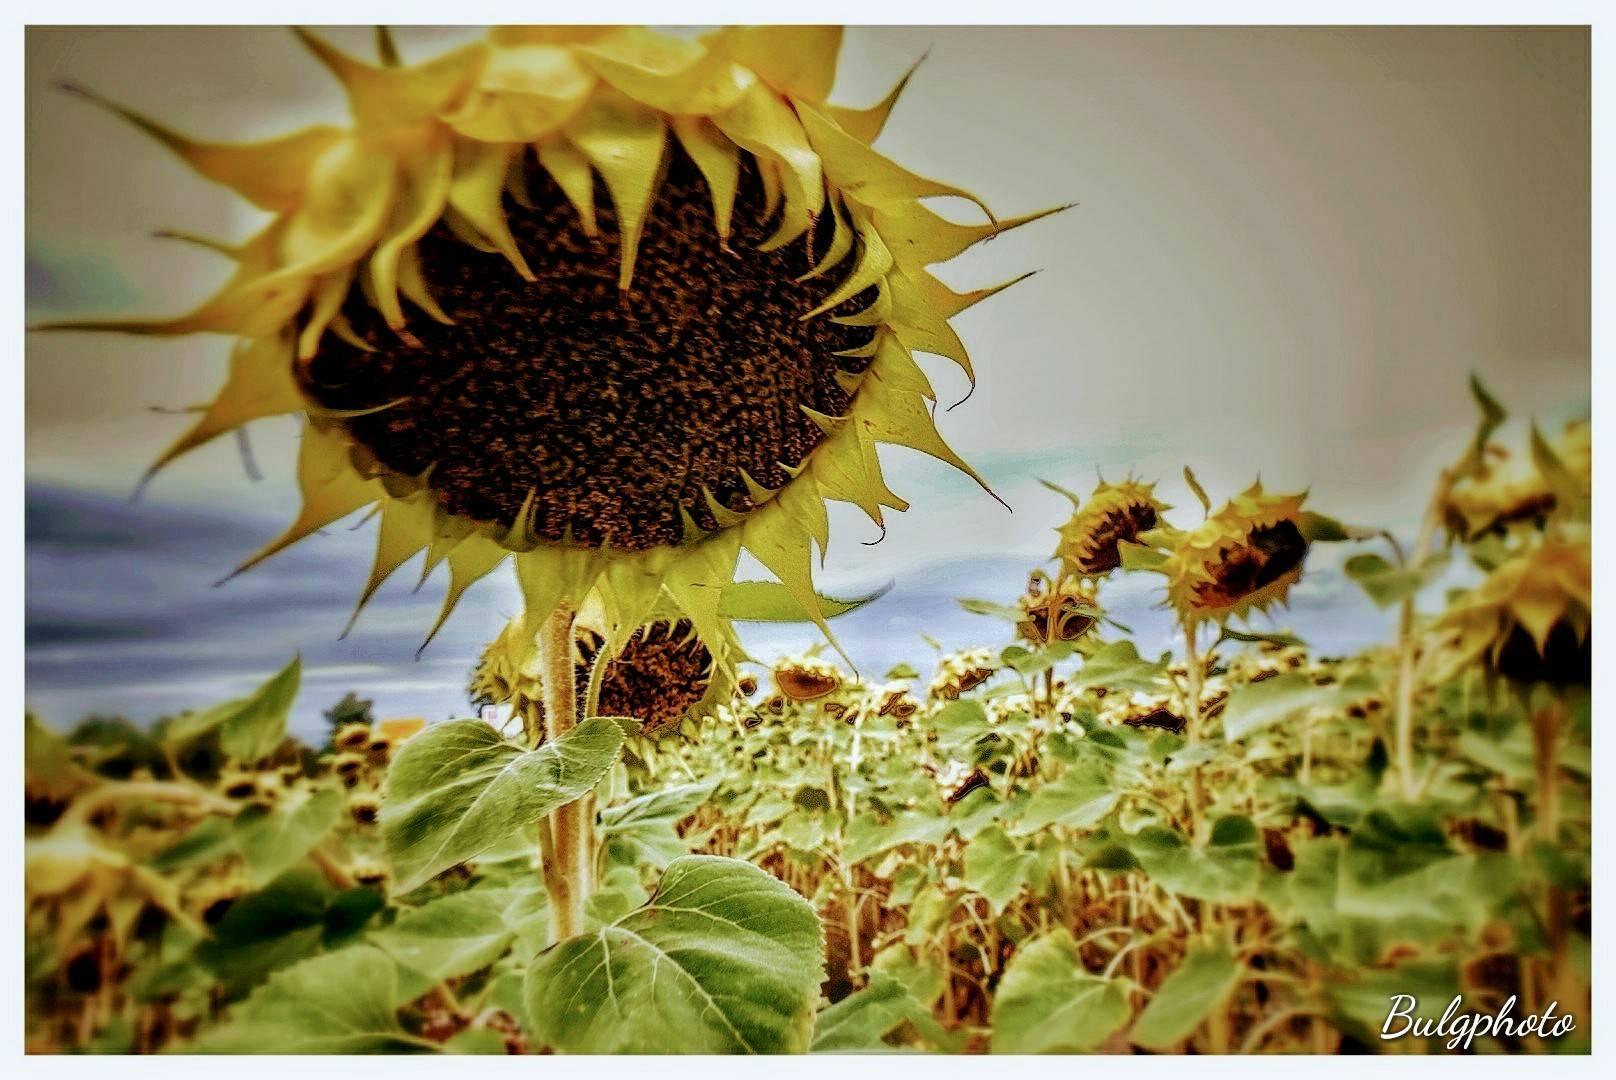 Sunflower by bulgphoto